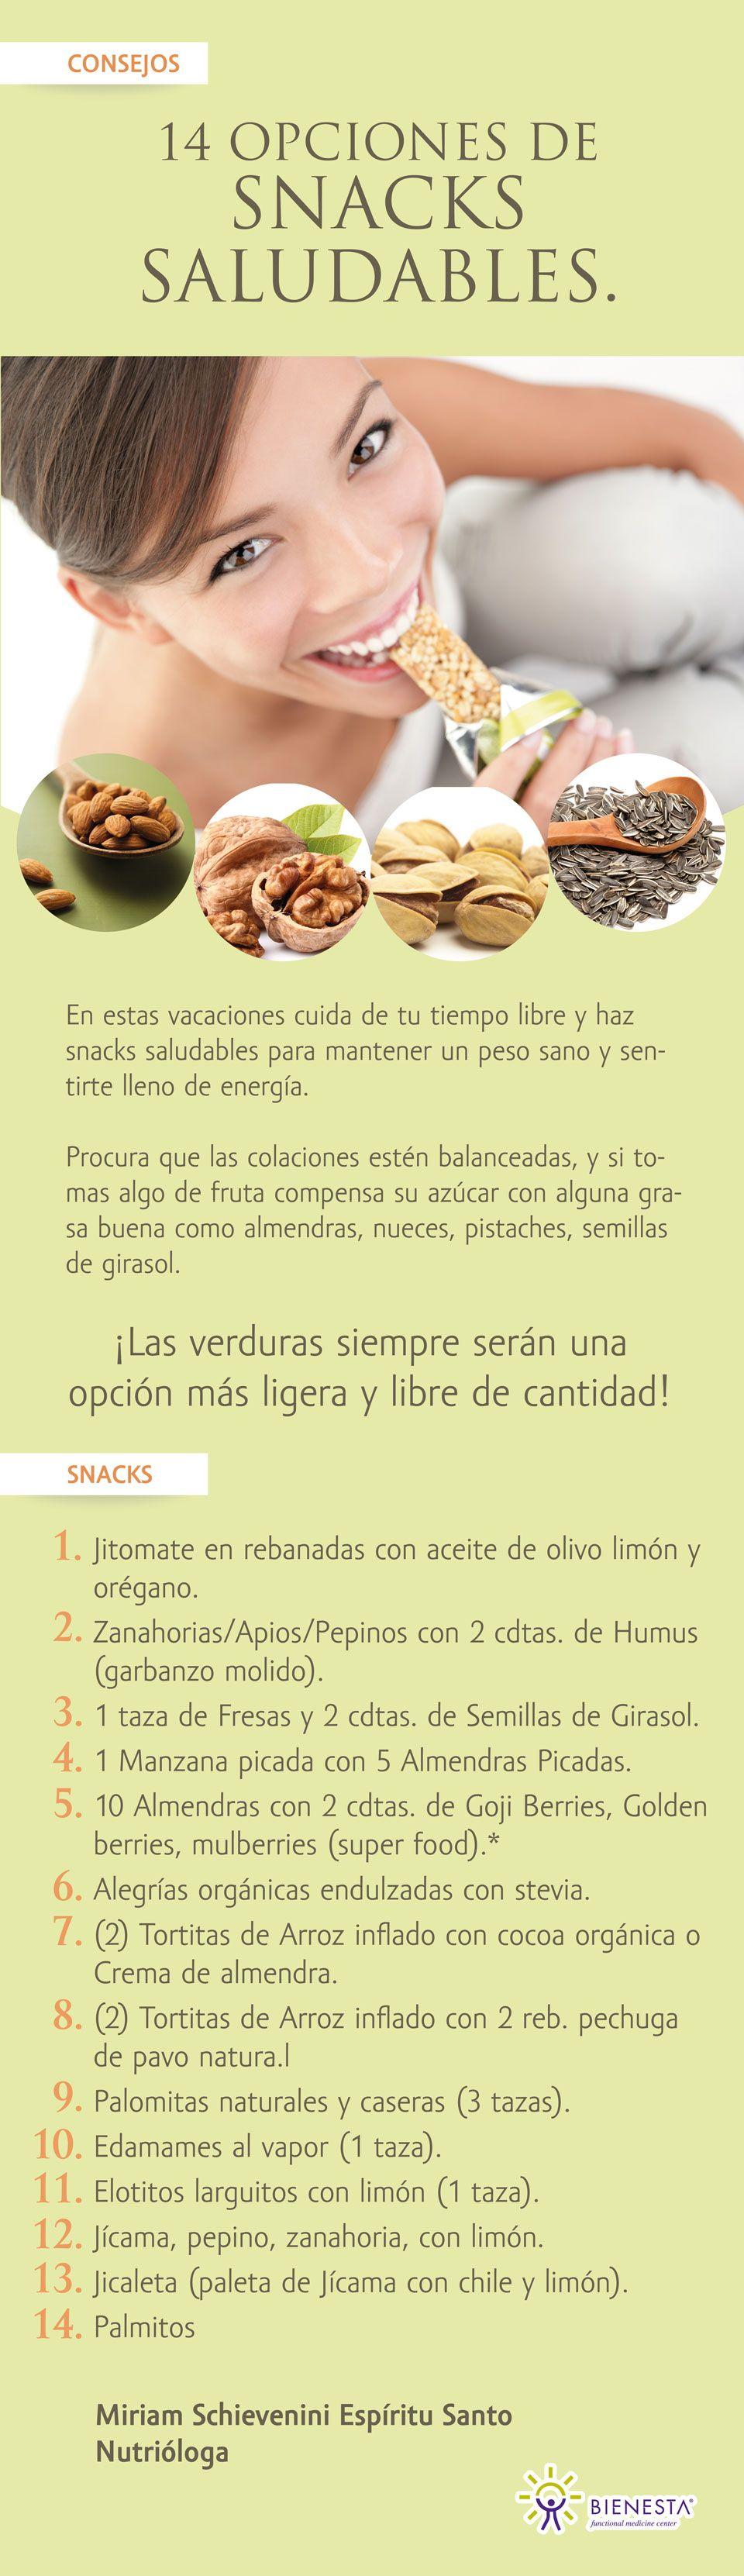 SNACKS_SALUDABLESOP Snacks saludables, Salud, Snack